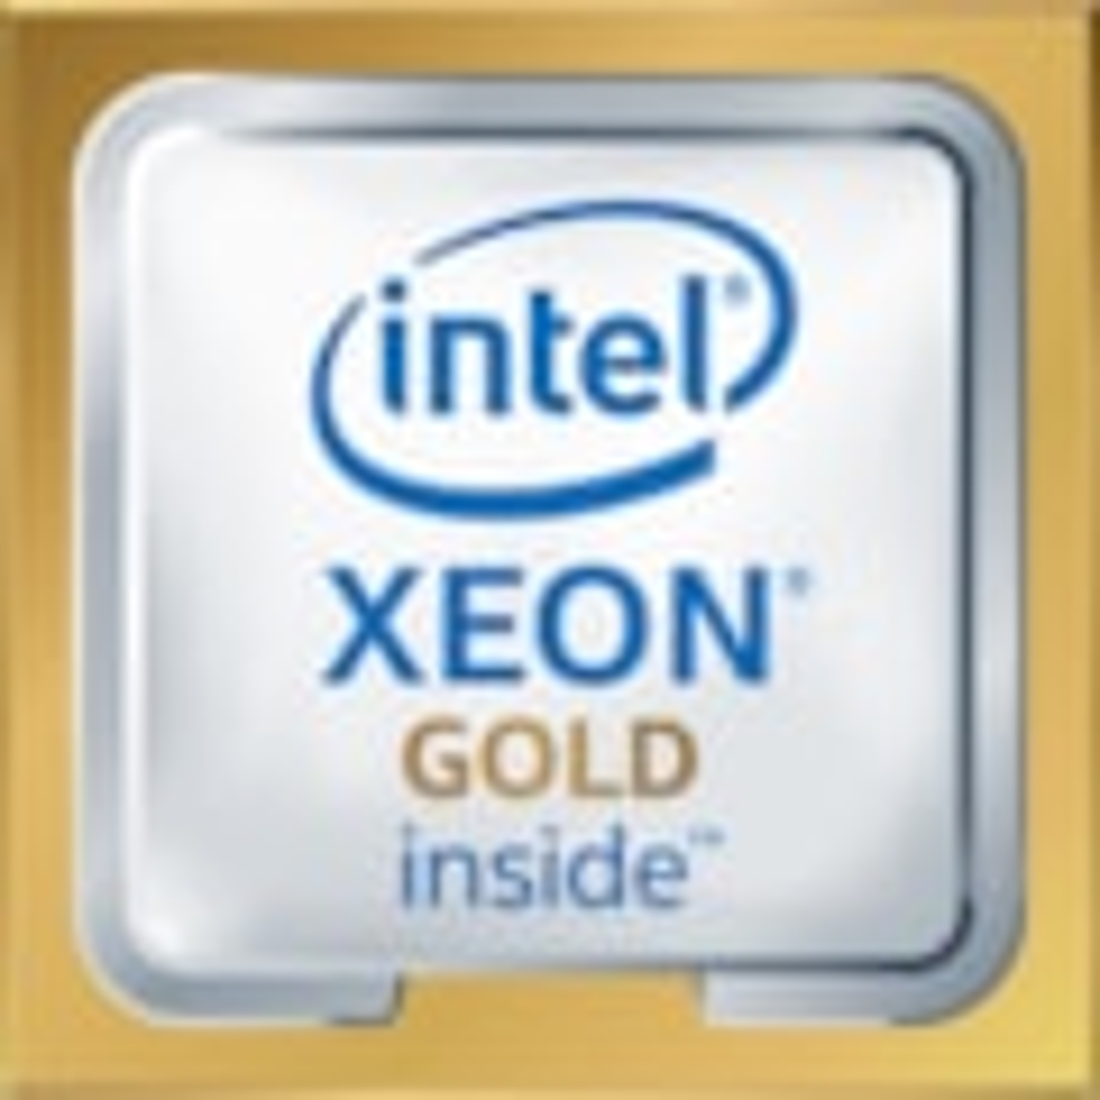 Cisco Intel Xeon Gold 5120 Tetradeca-core (14 Core) 2.20 GHz Processor Upgrade